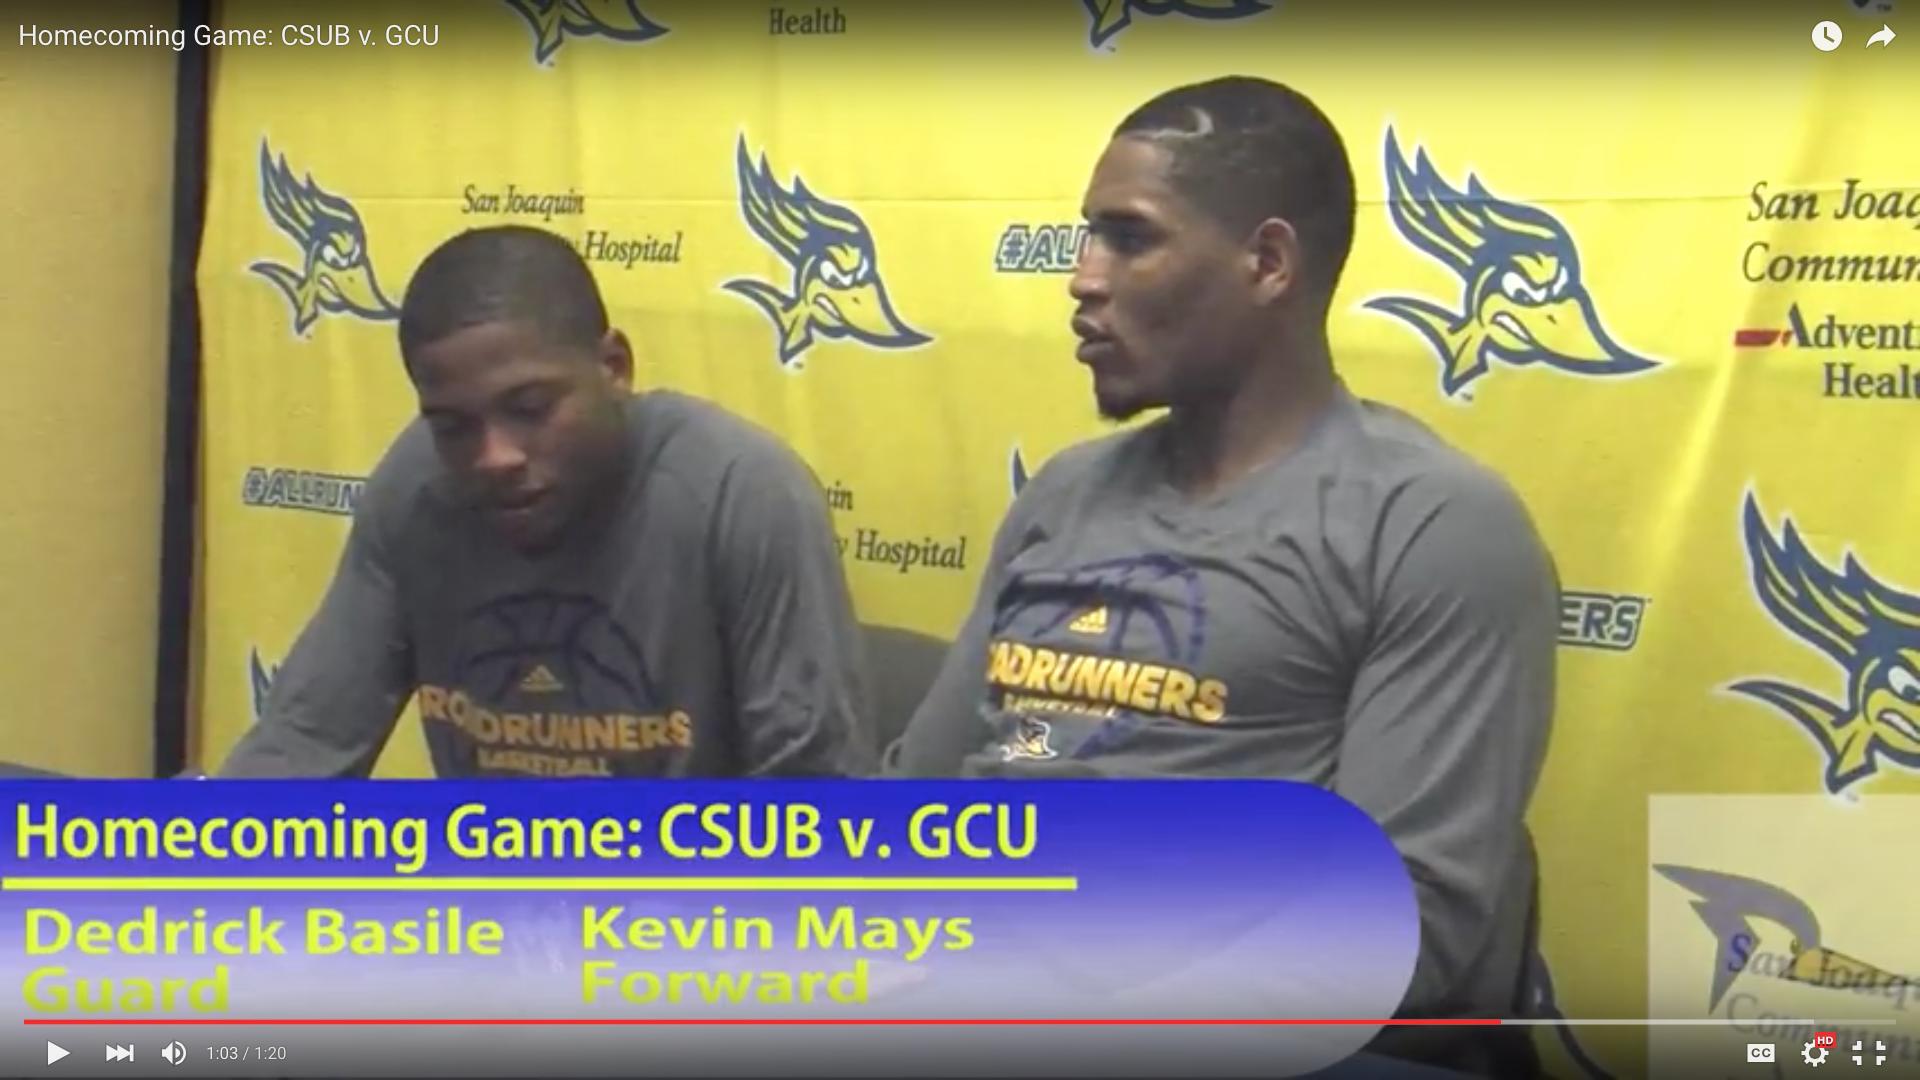 Homecoming Game: CSUB v. GCU